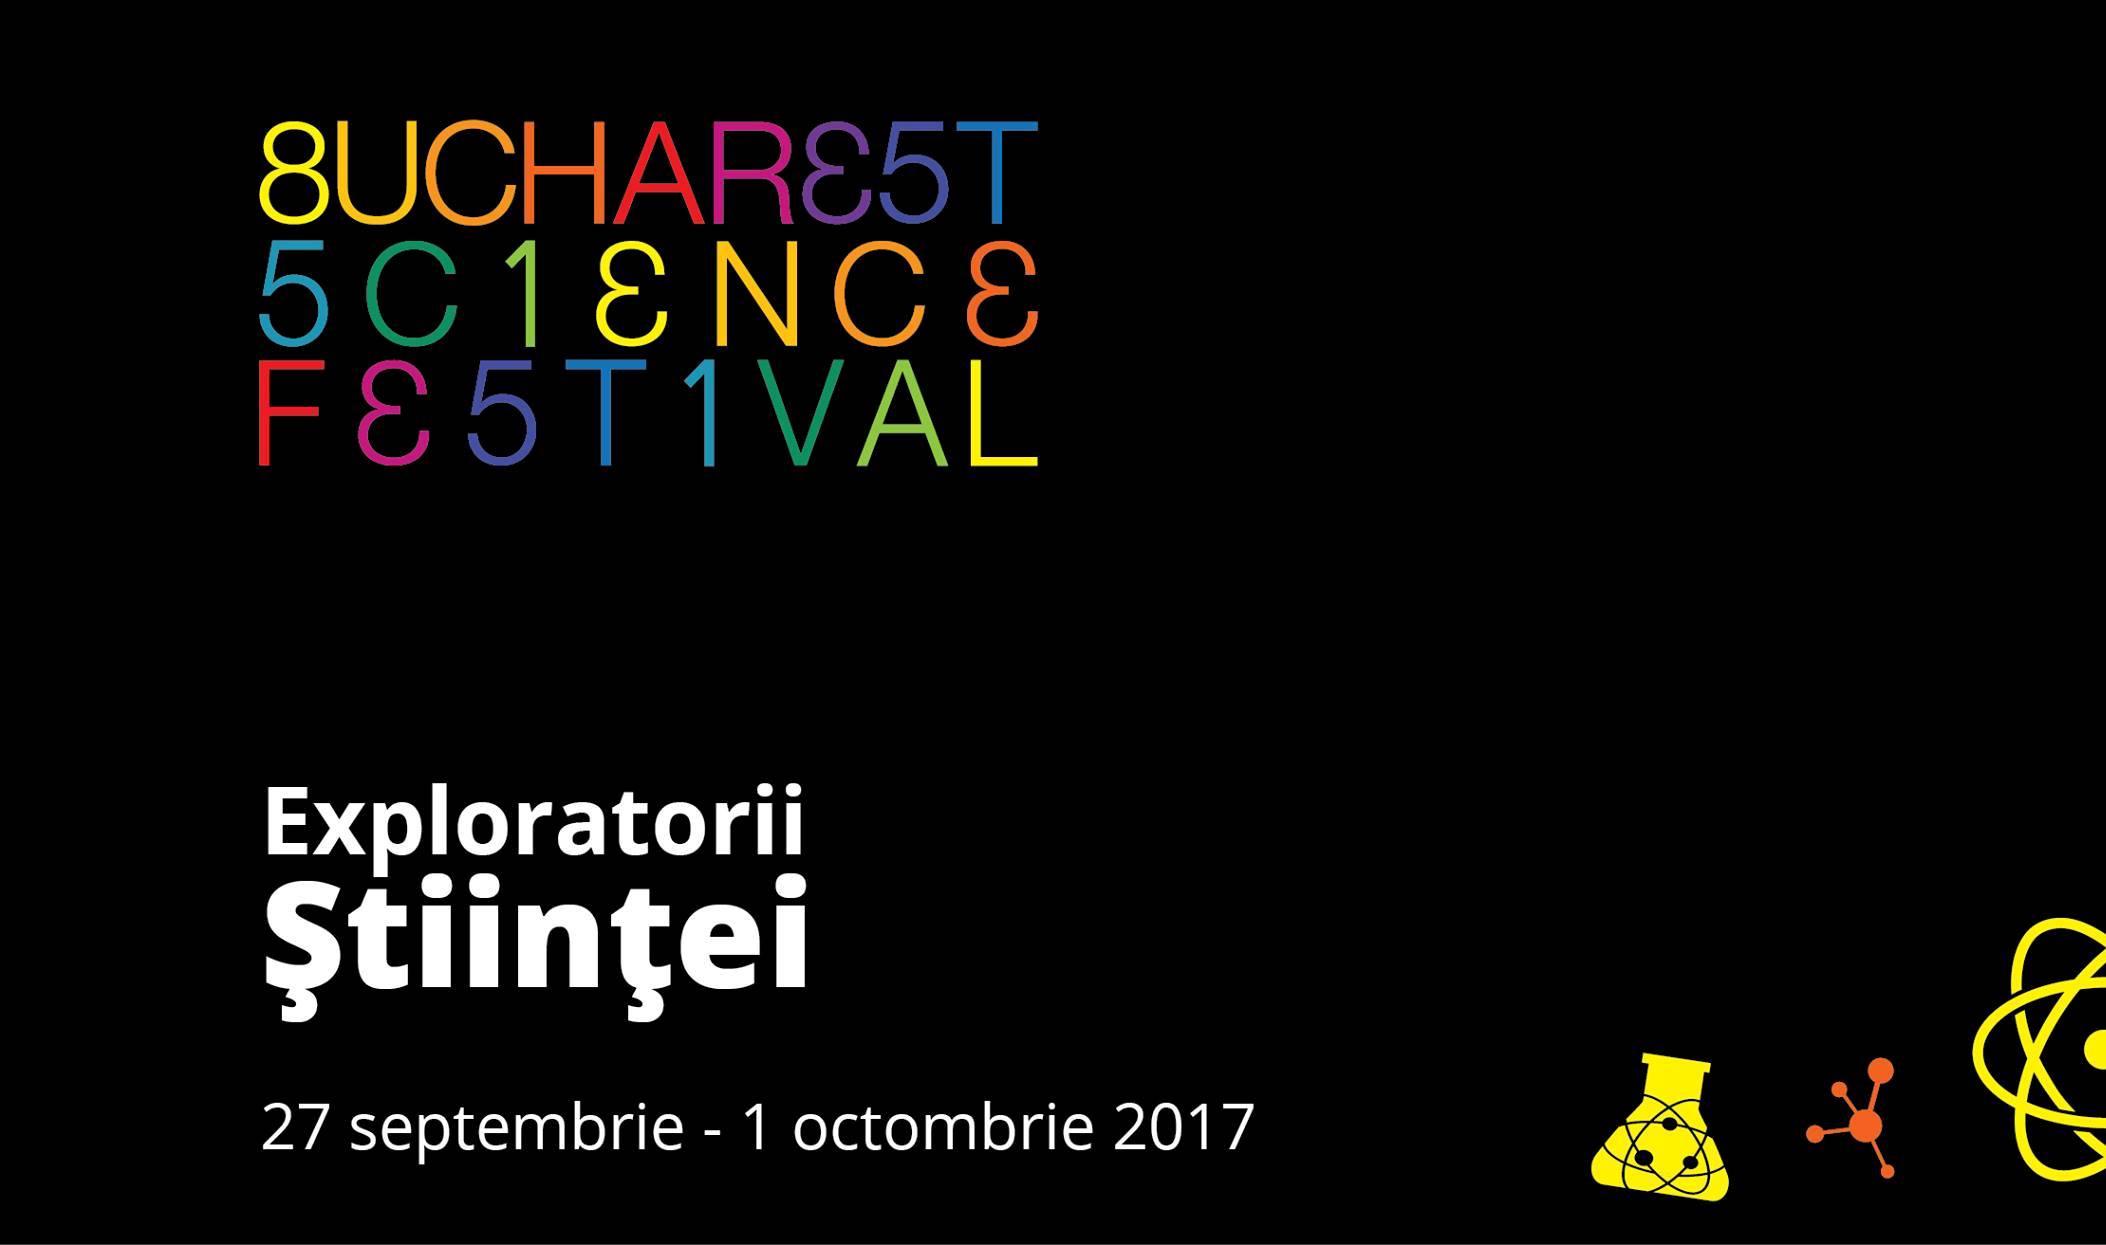 Școala Intuitext susține Bucharest Science Festival